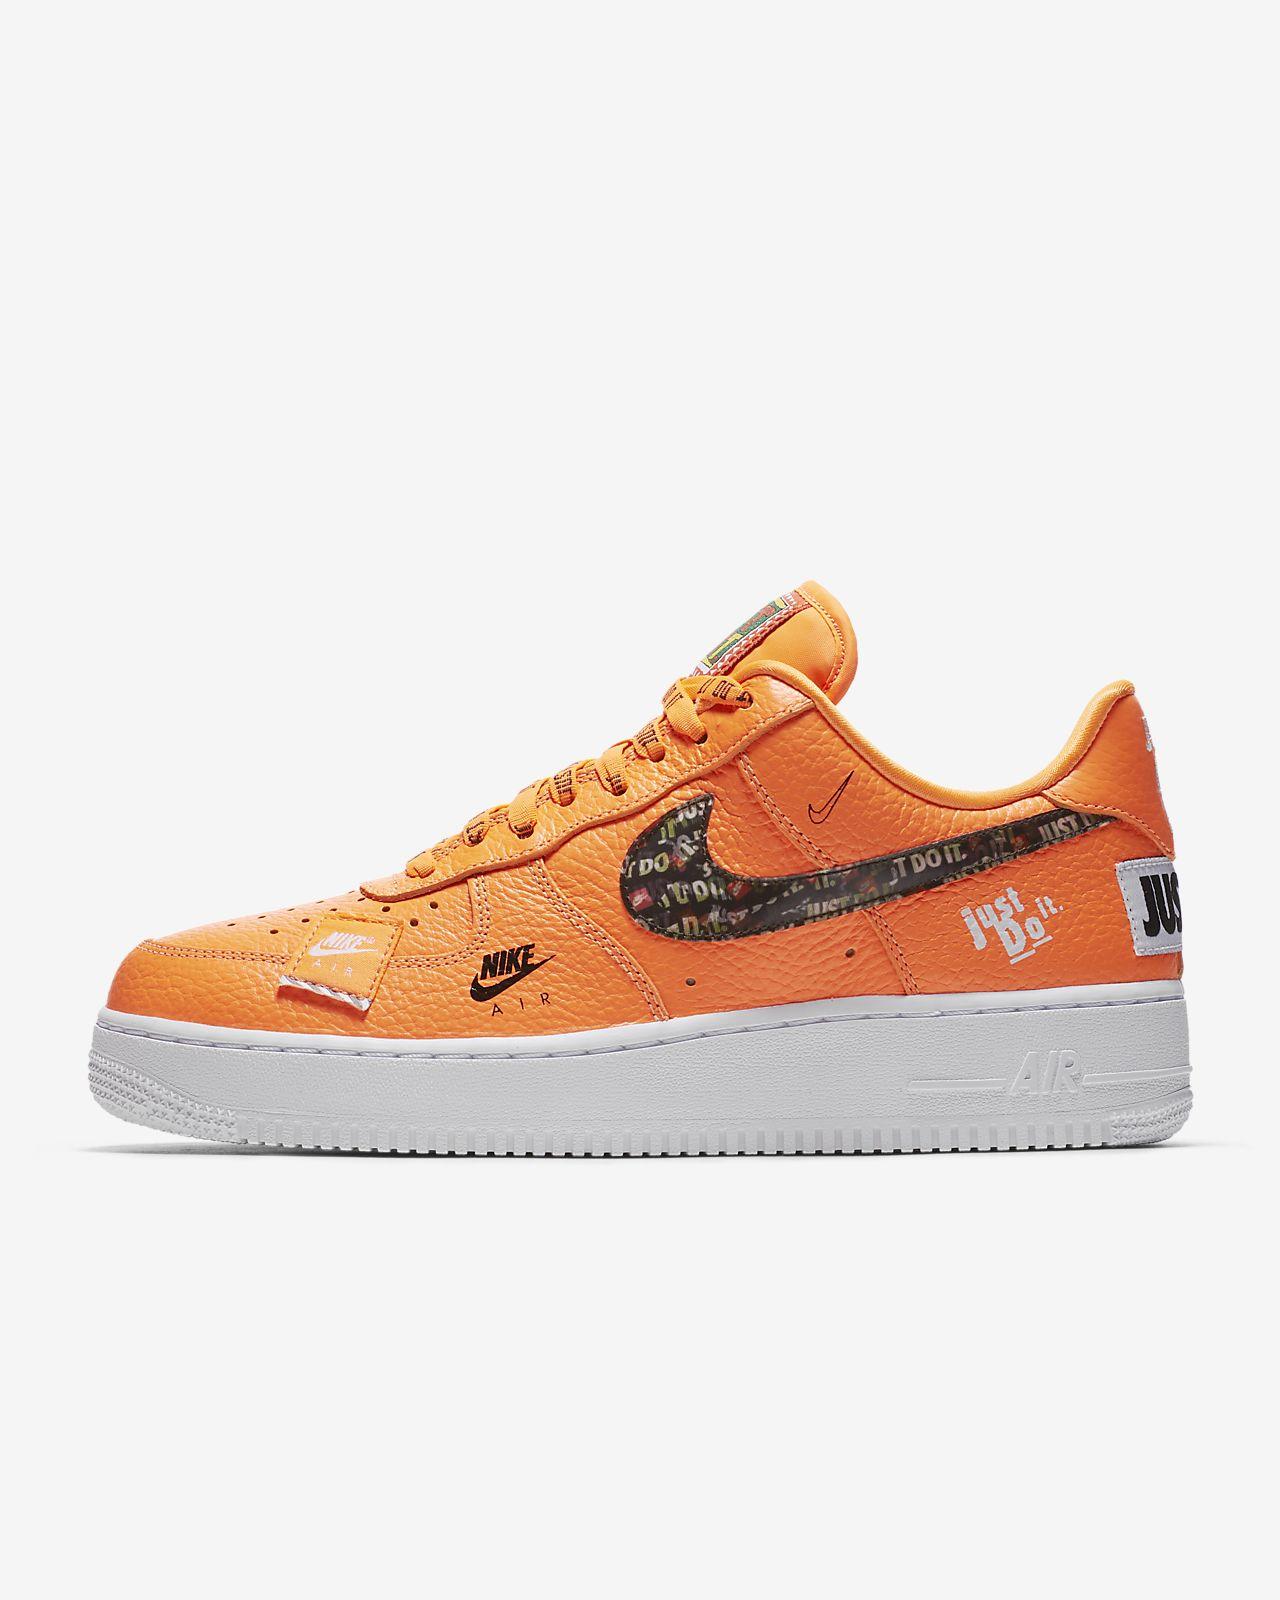 Acquista 2 OFF QUALSIASI scarpe nike air force one CASE E